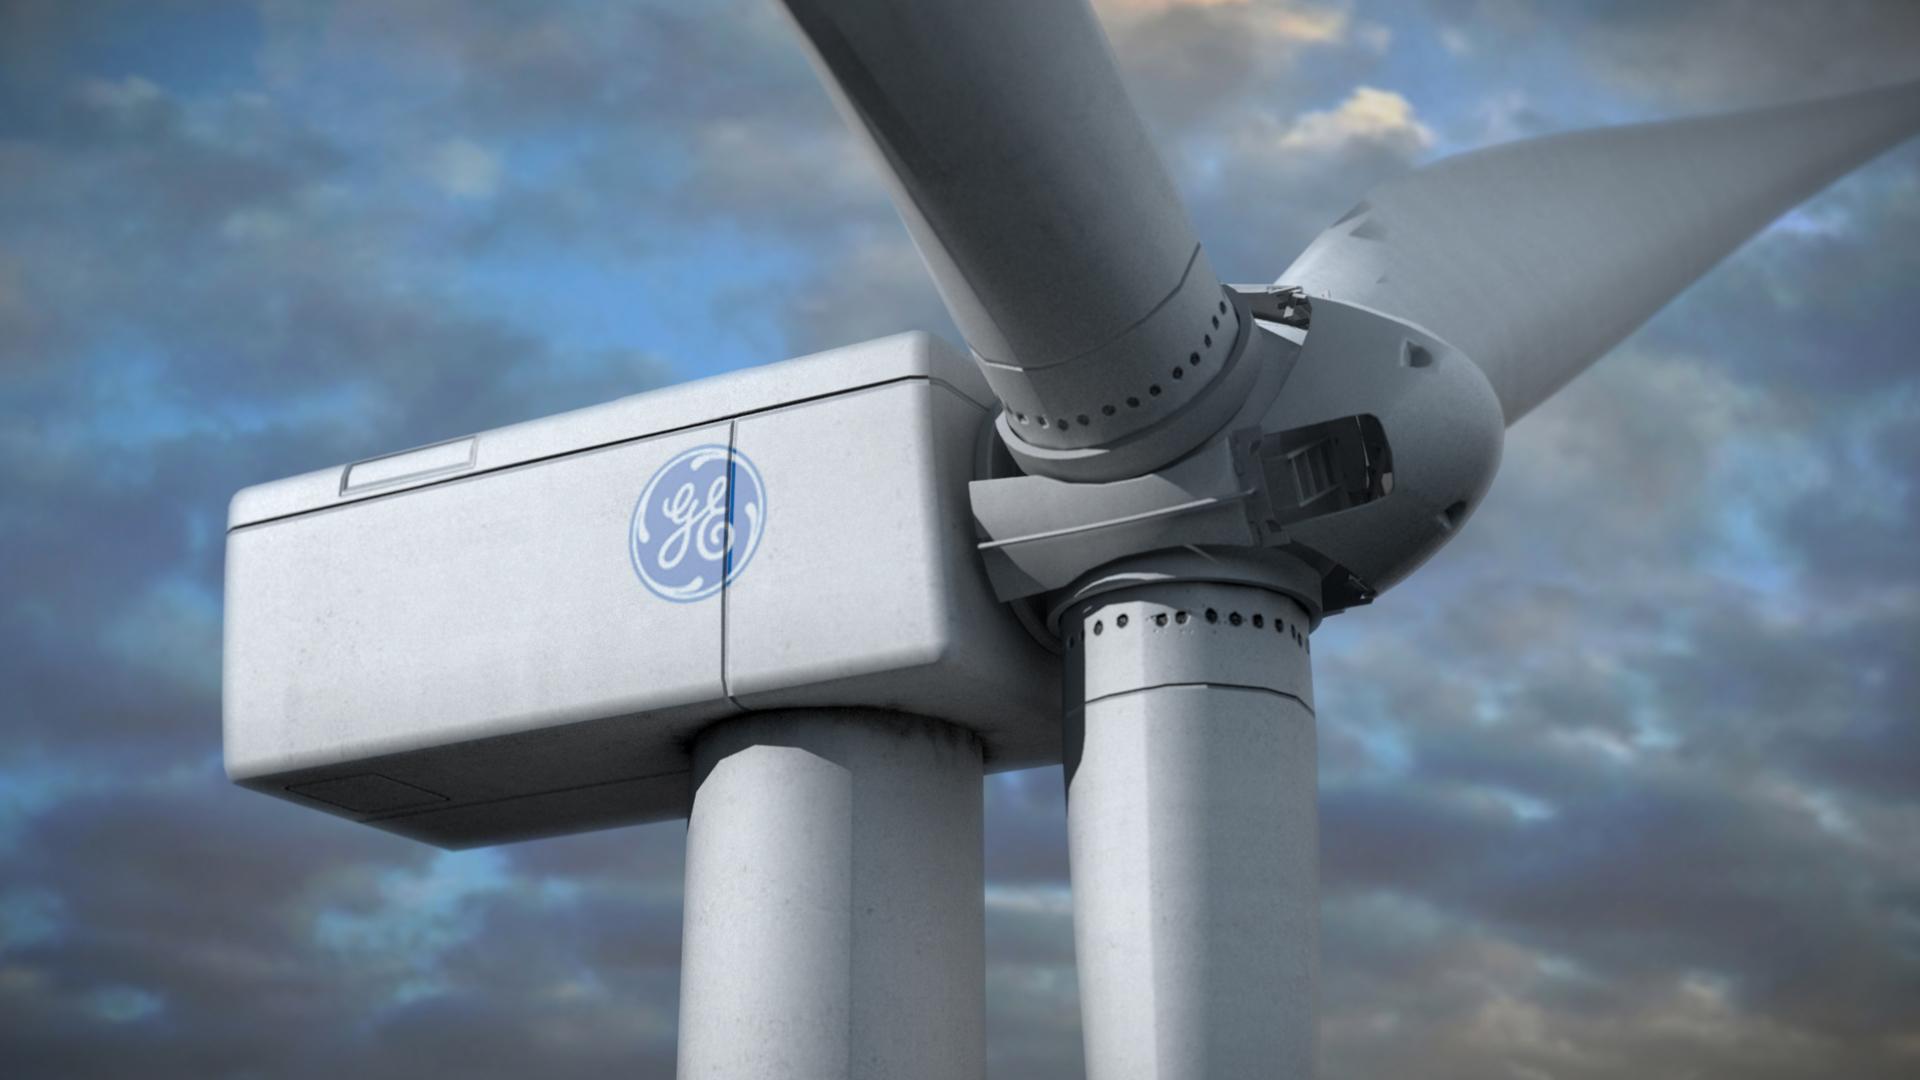 GE turbine logo